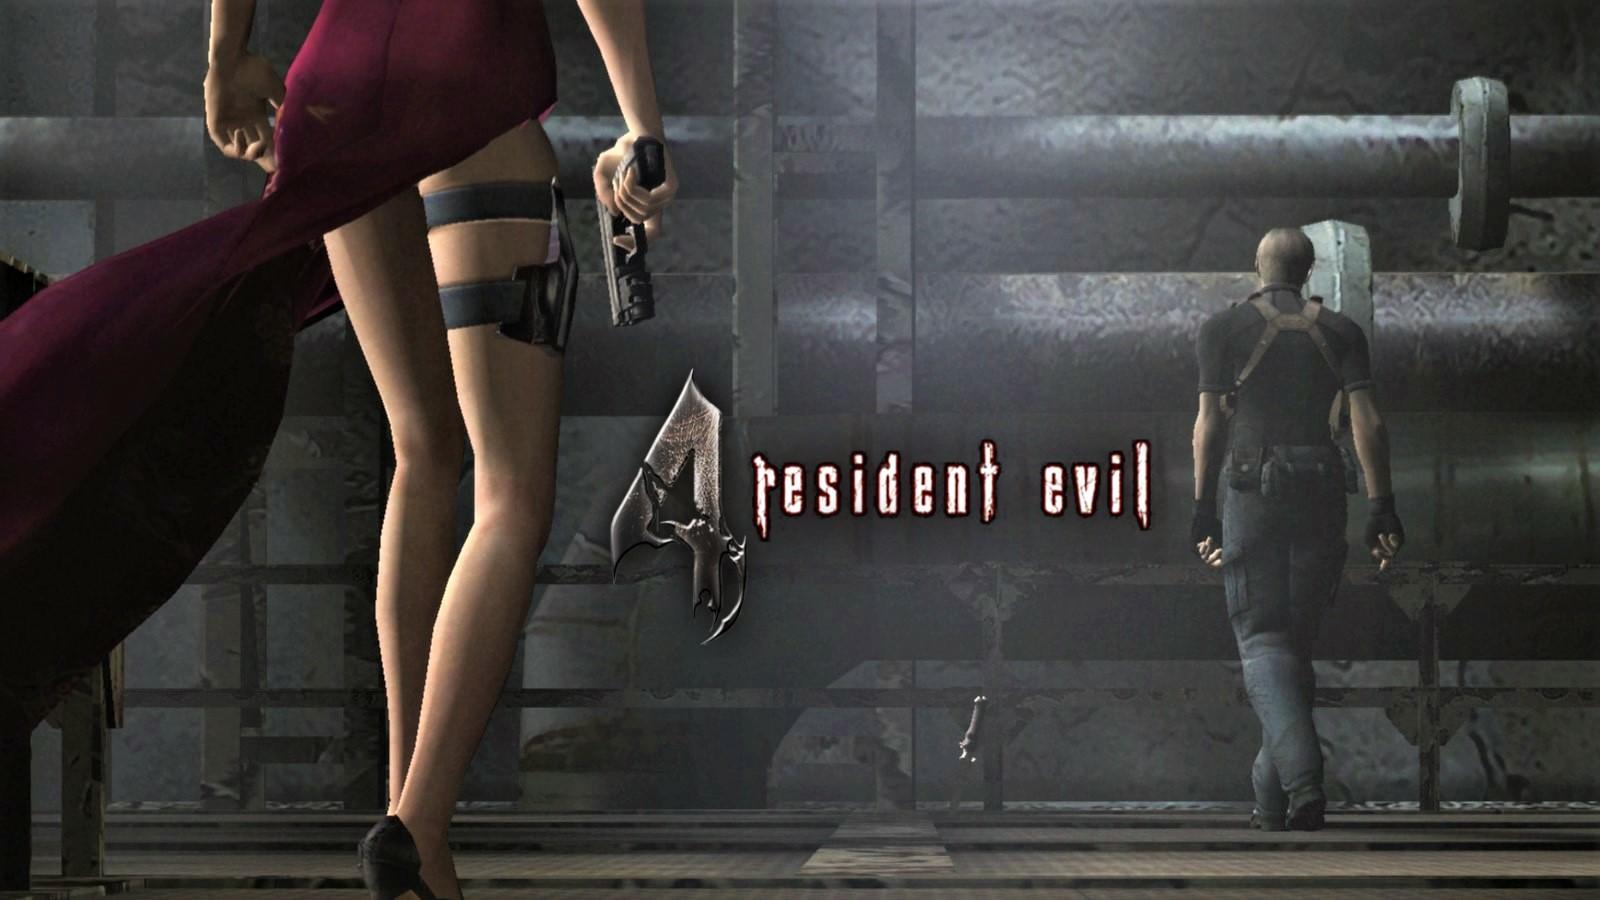 Ада Вонг - Resident Evil 4 Ада Вонг, Леон Кеннеди